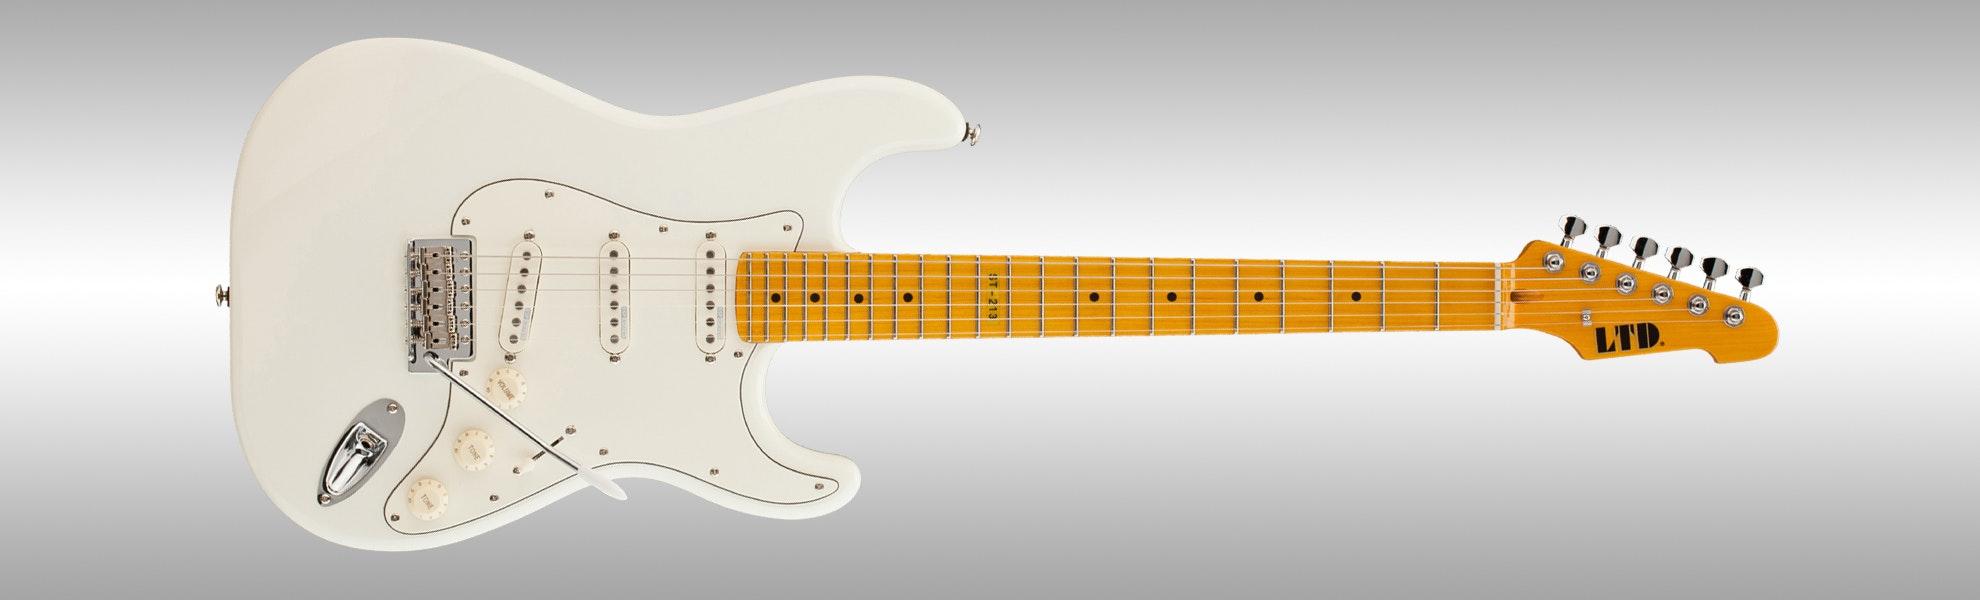 ESP LTD ST-213 Maple OW B-Stock Electric Guitar